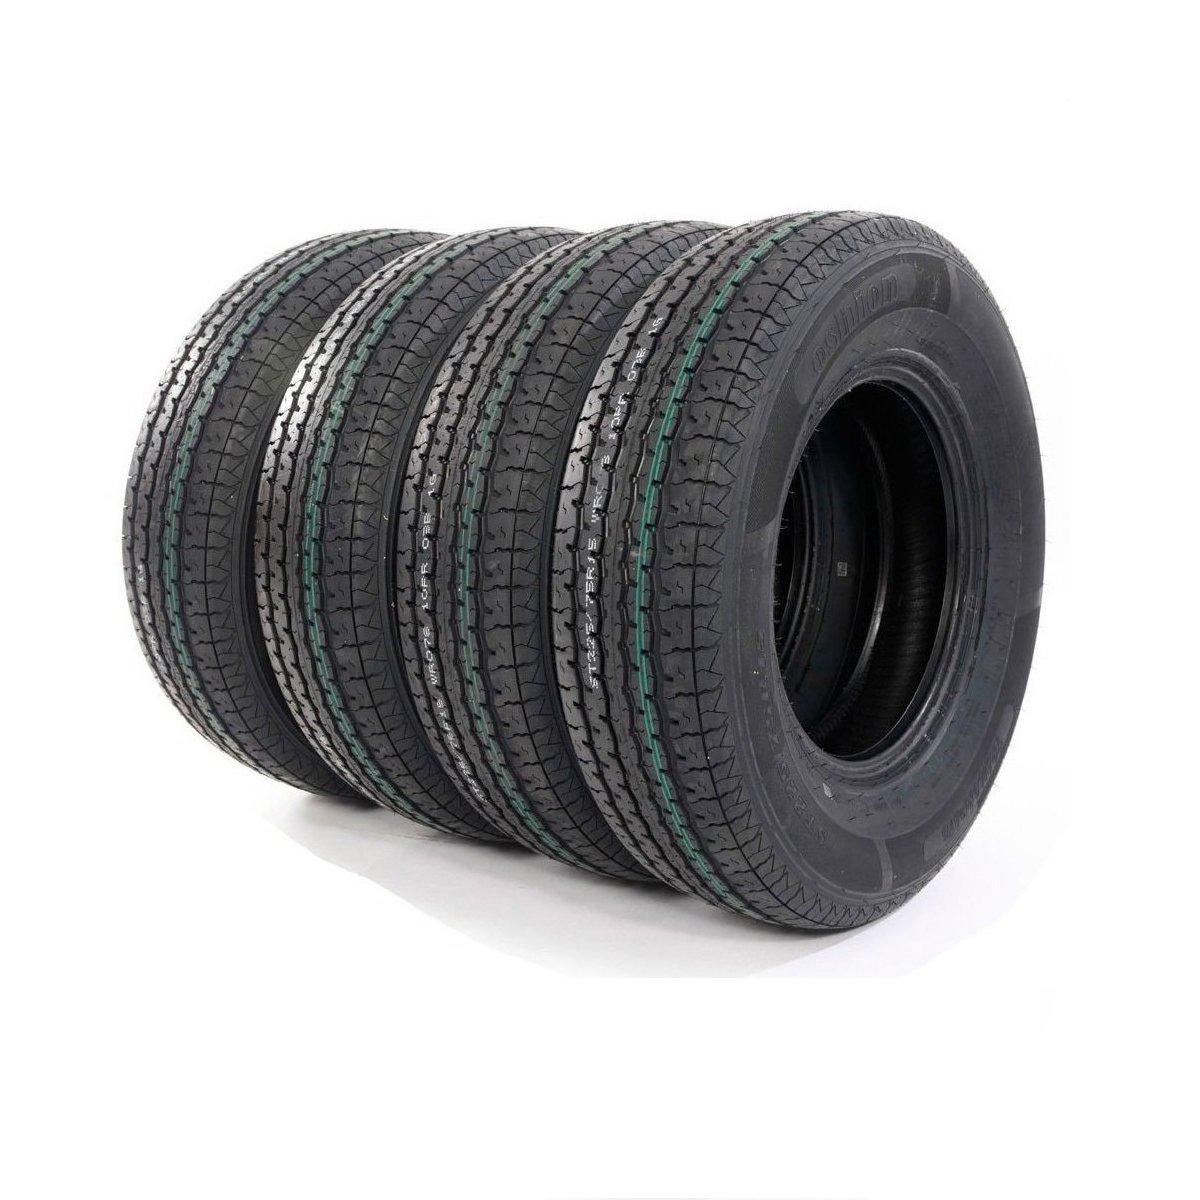 MILLION PARTS 4 Load Radial Trailer Tires ST225/75R15 10 Ply Load Range E